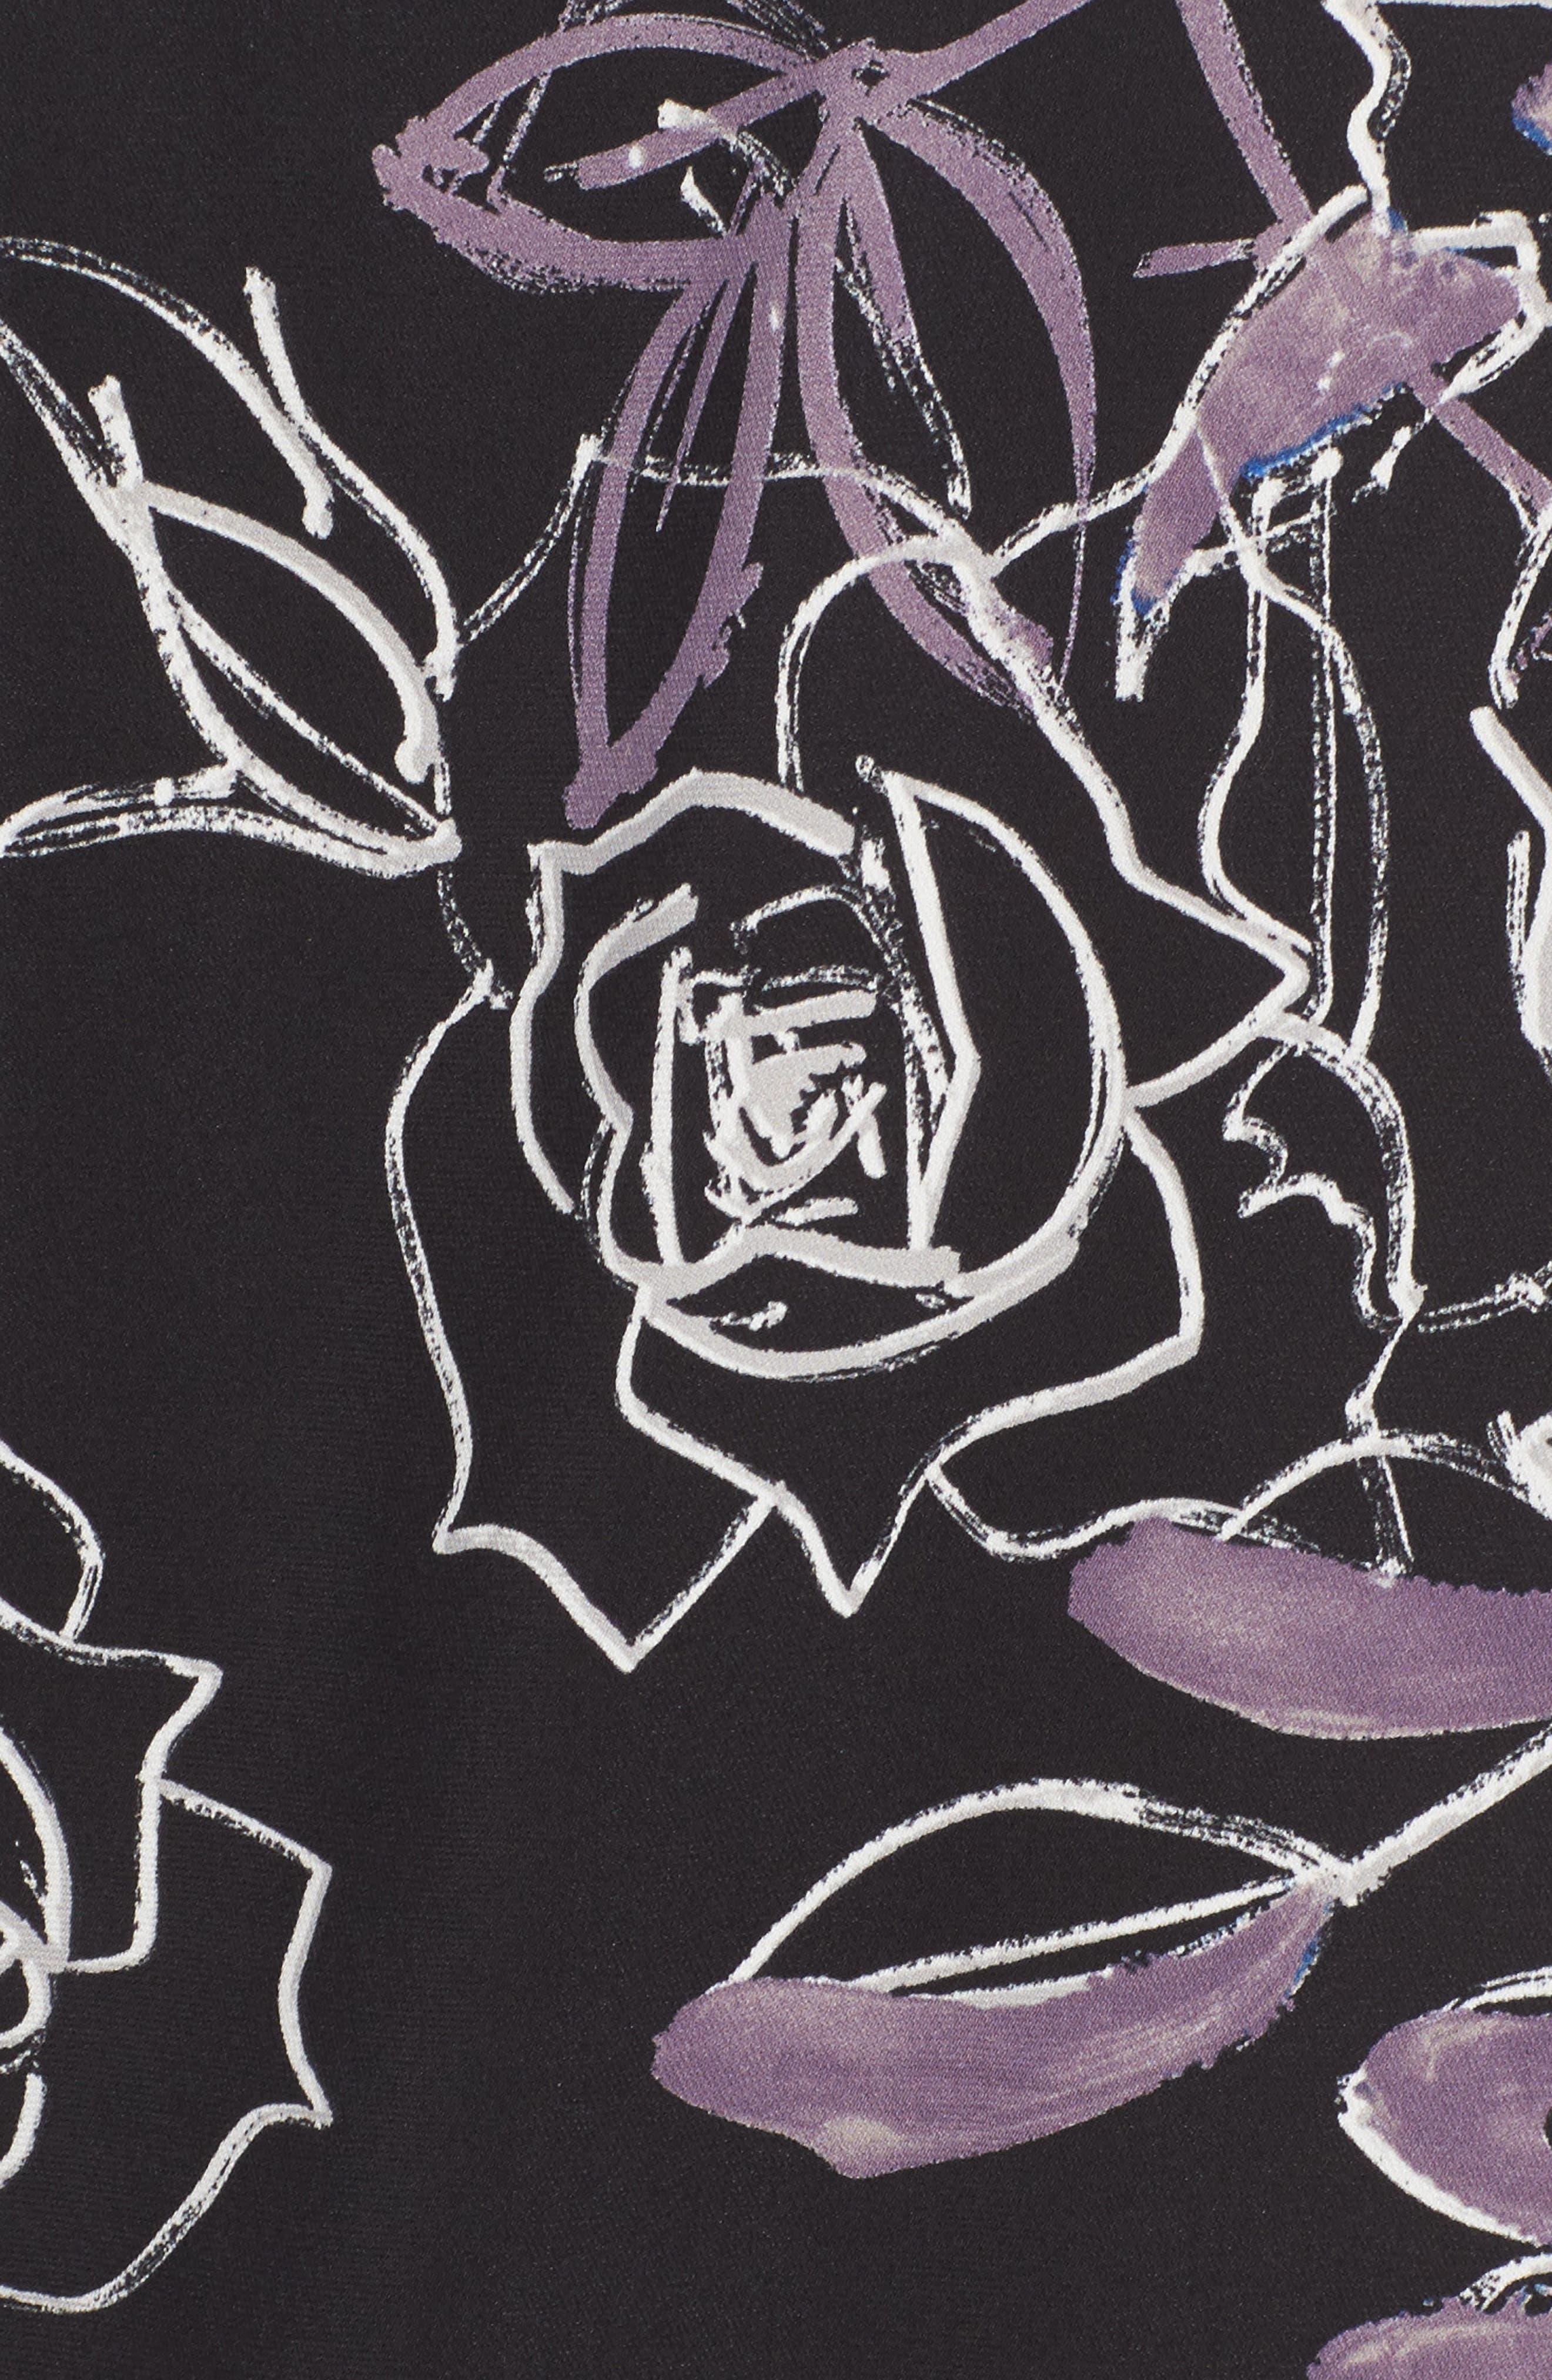 Long Sleeve Print Blouse,                             Alternate thumbnail 5, color,                             Black Roses Print